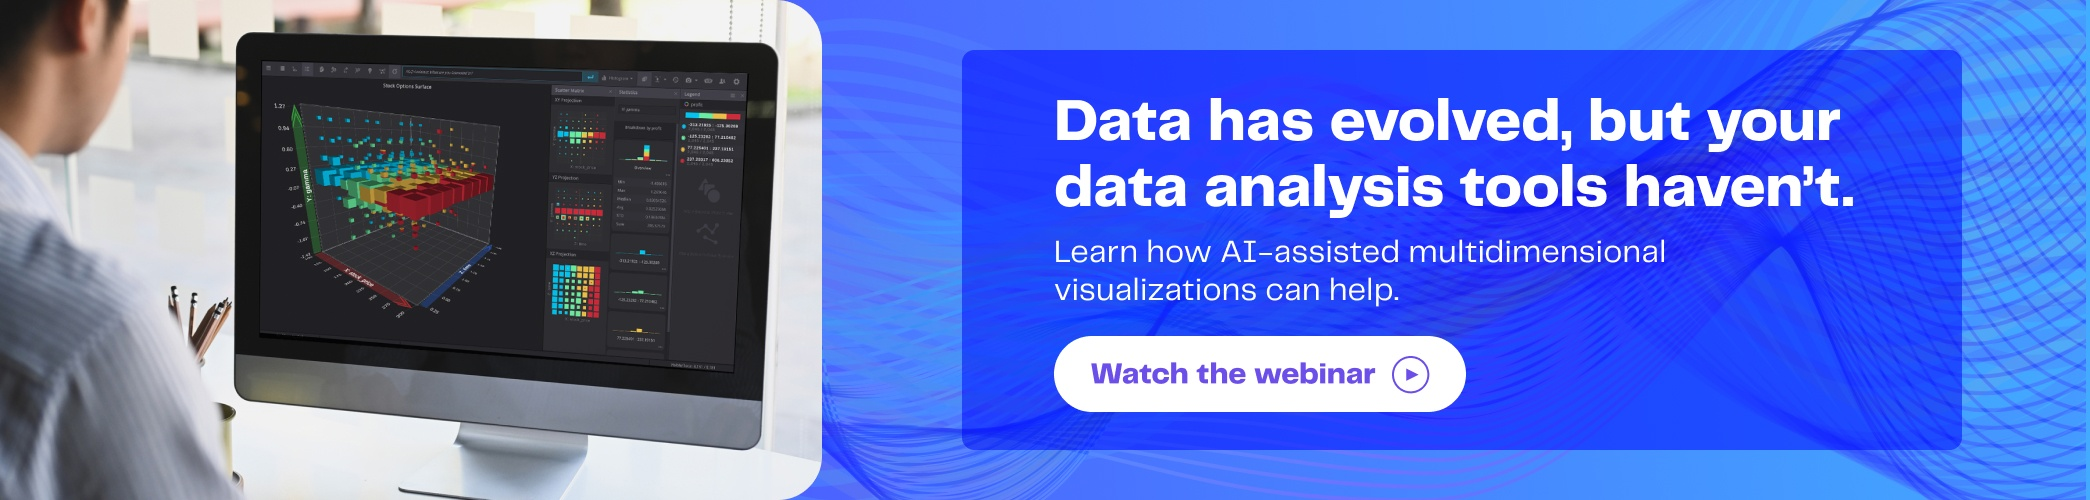 Watch the on-demand machine learning webinar